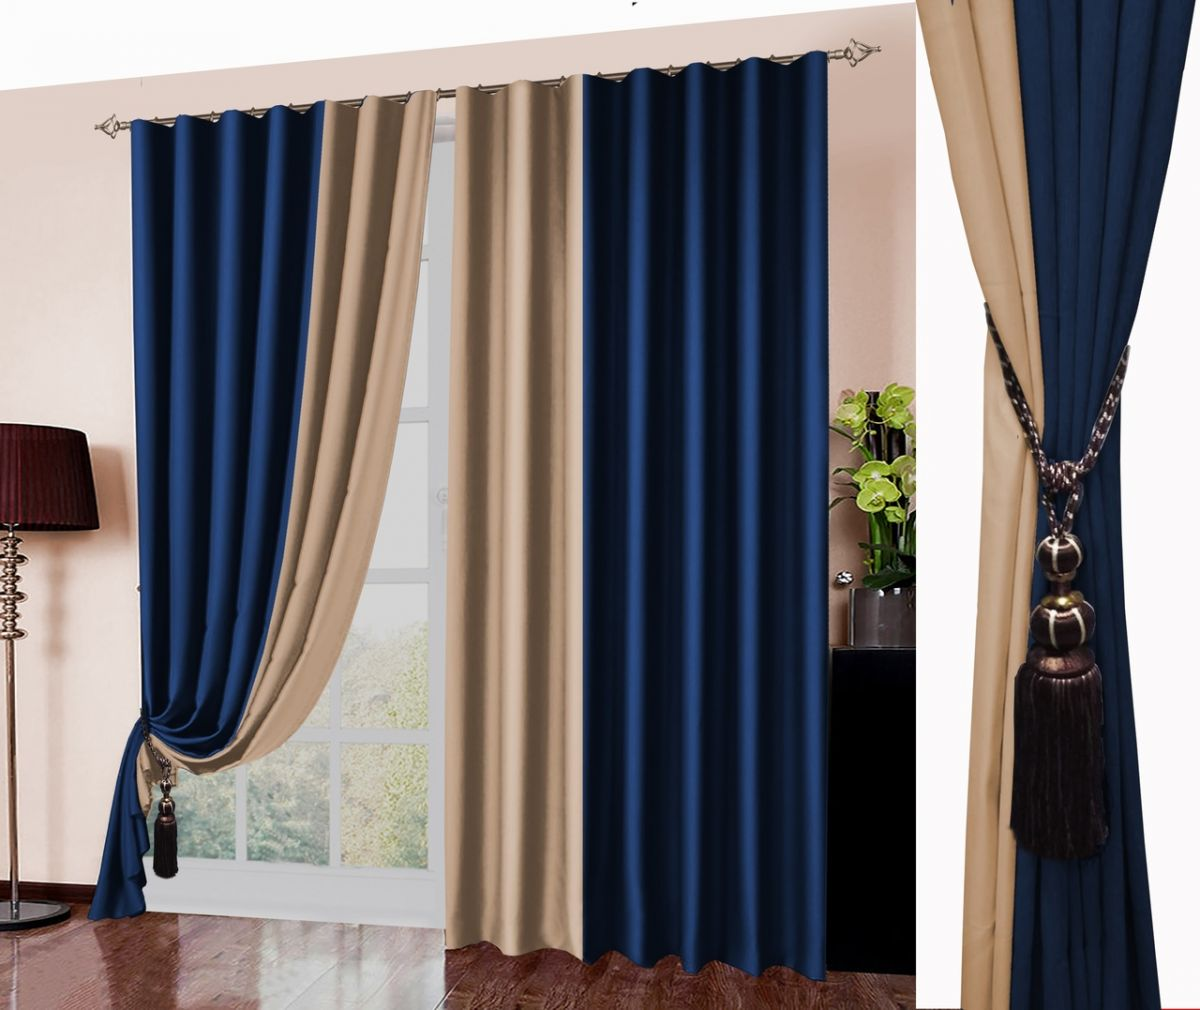 Комплект штор № 026, (270*180)х2, Блэк-аут (комбинированный) синий+беж